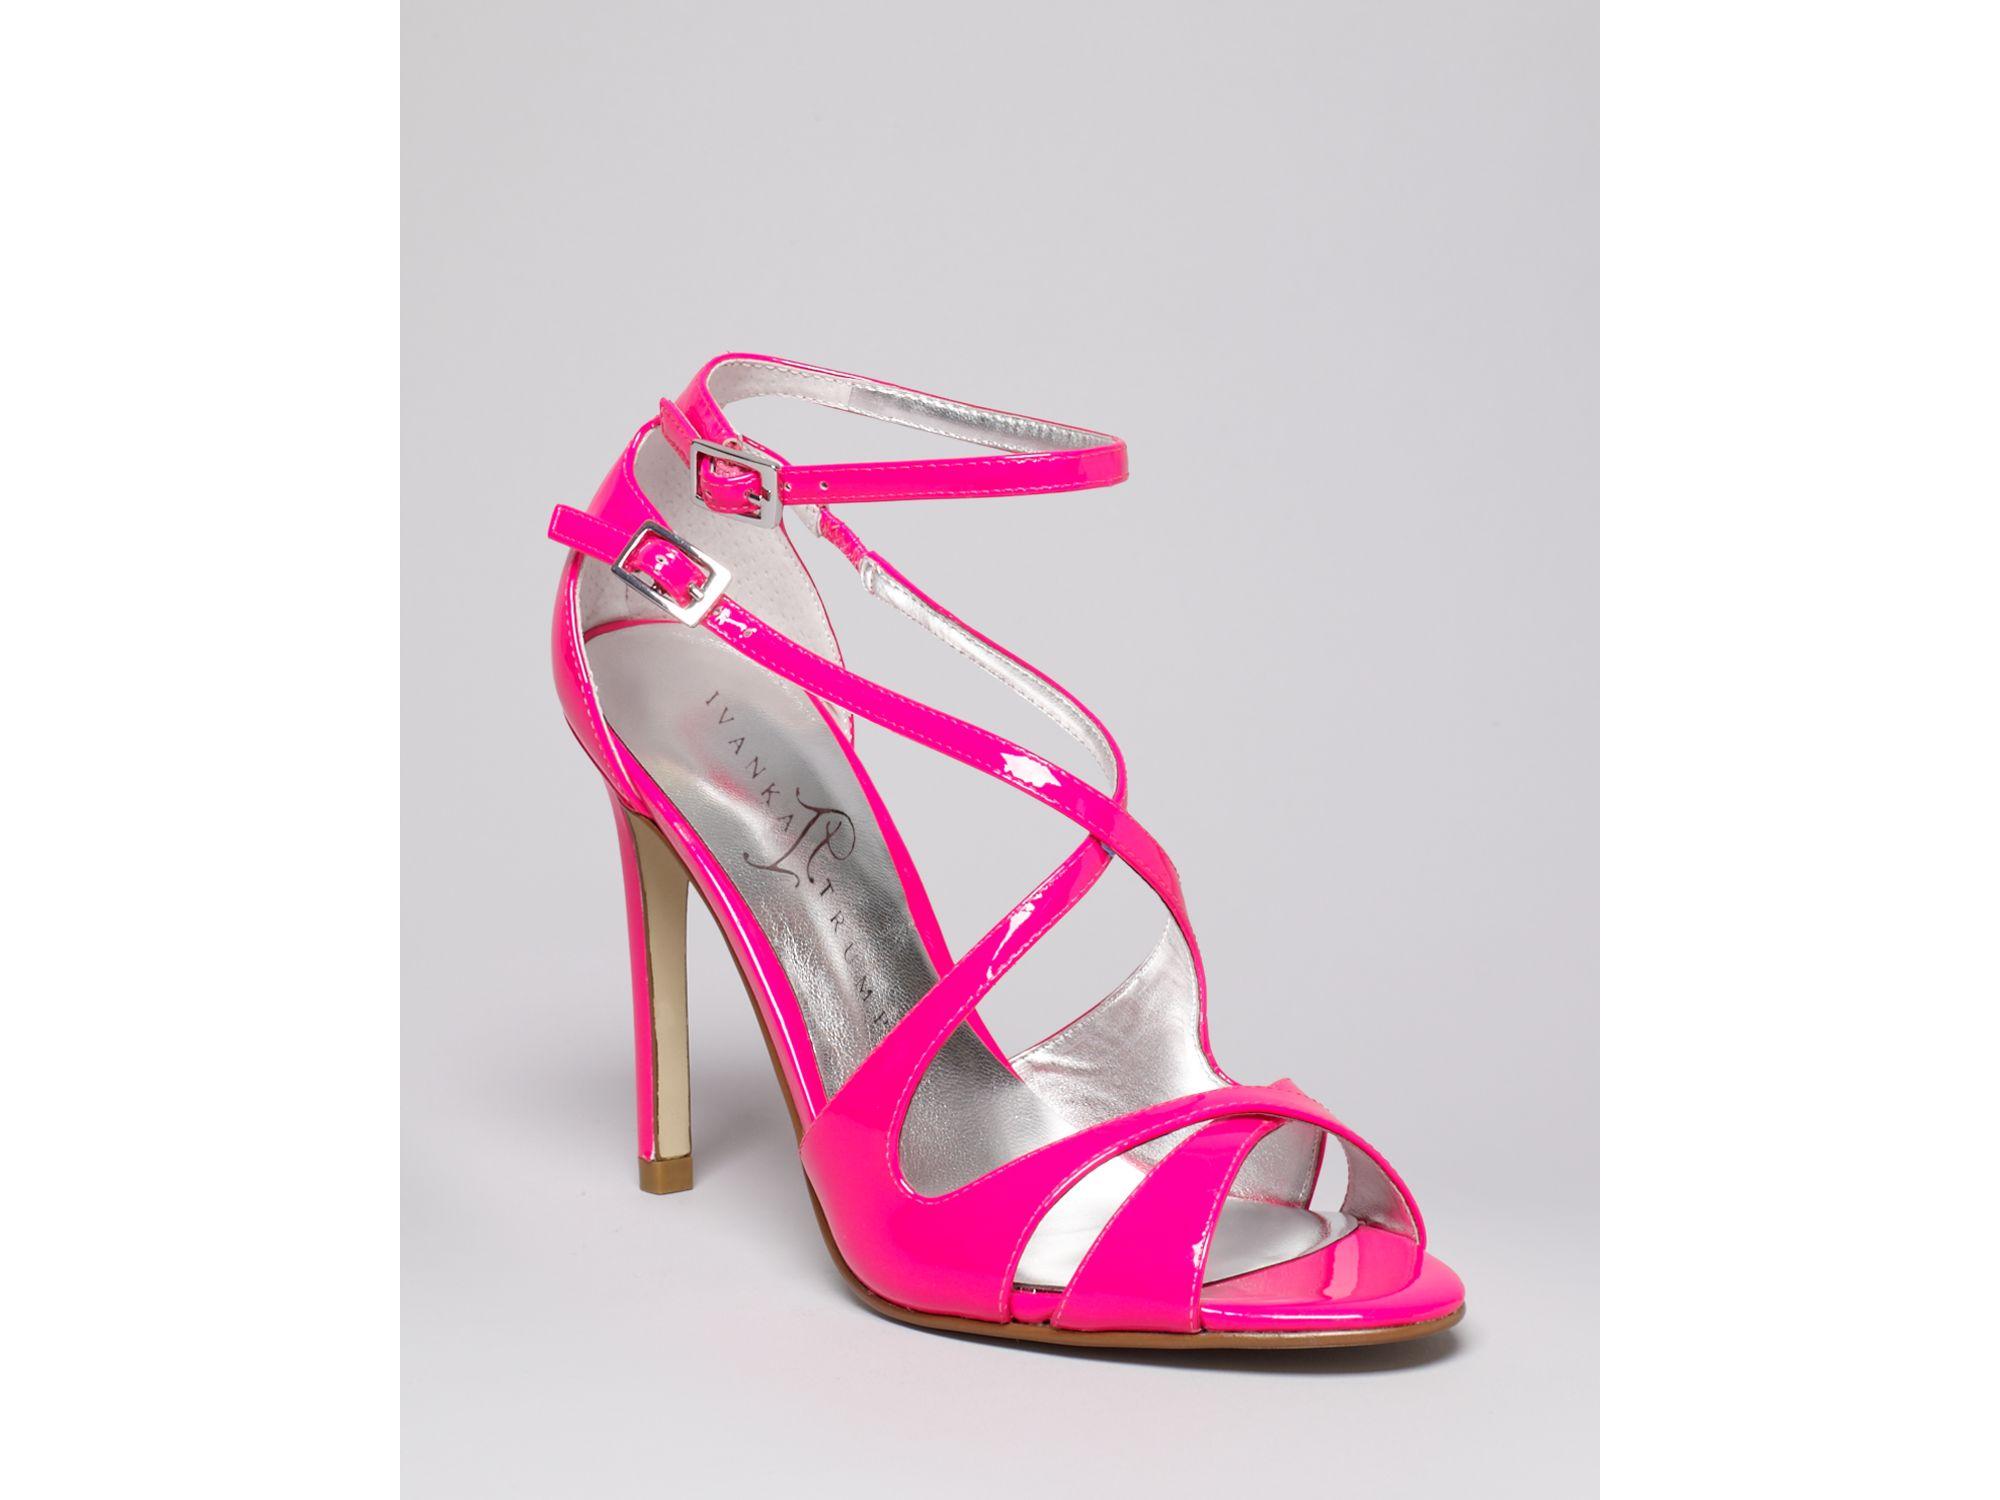 Ivanka trump Helice High Heel Strappy Sandals in Pink | Lyst